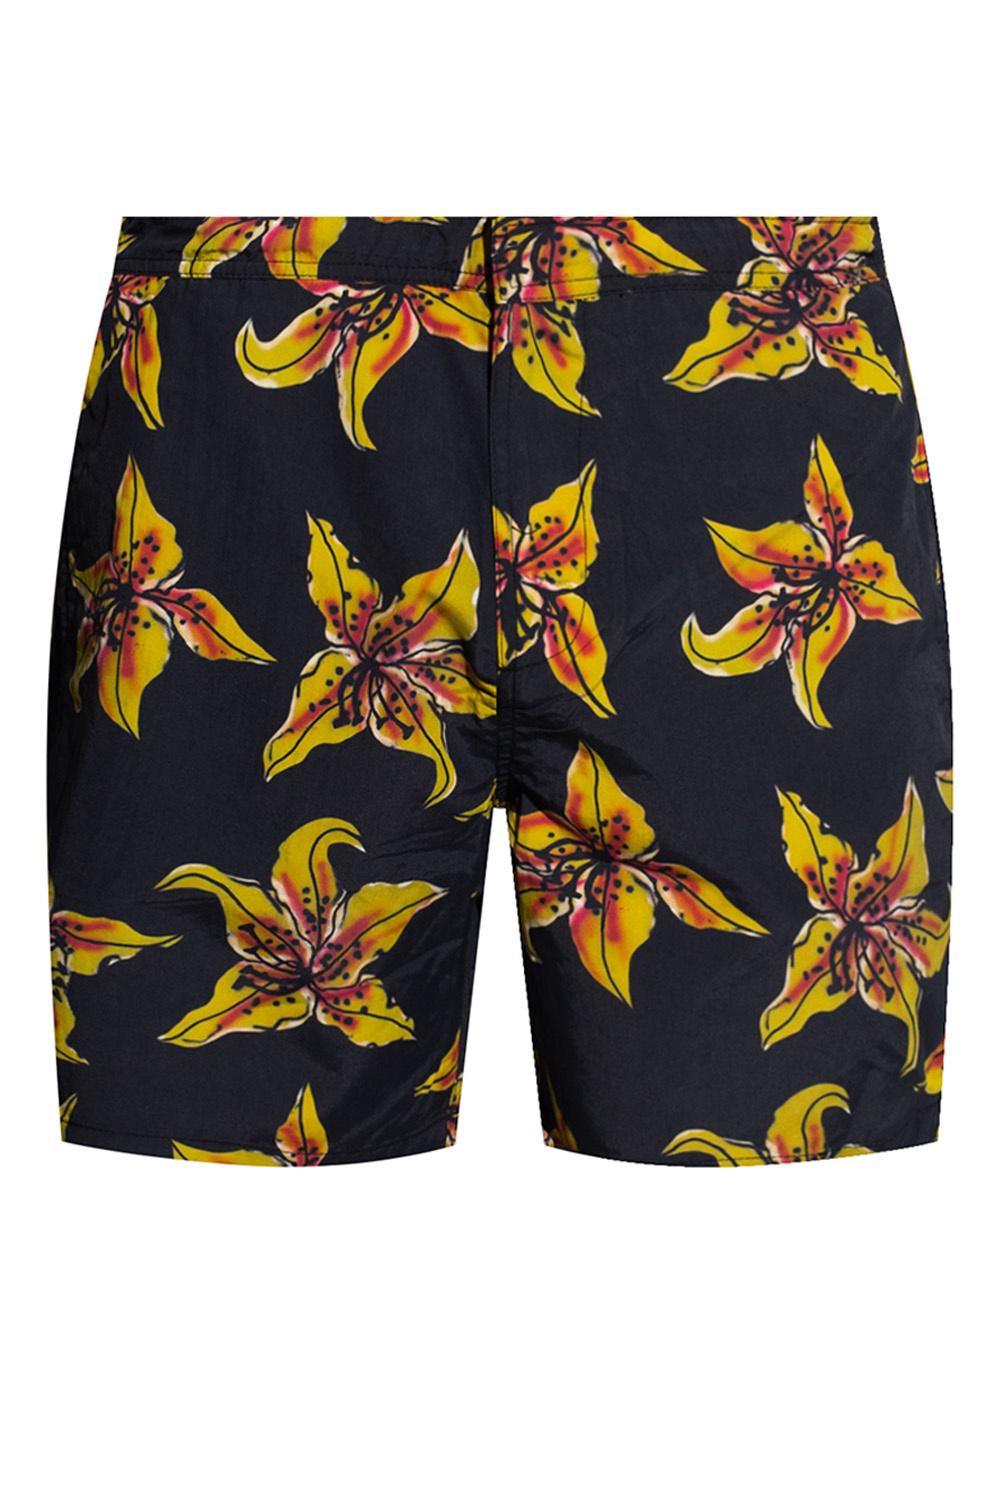 AllSaints 'Hibiscus' swim shorts